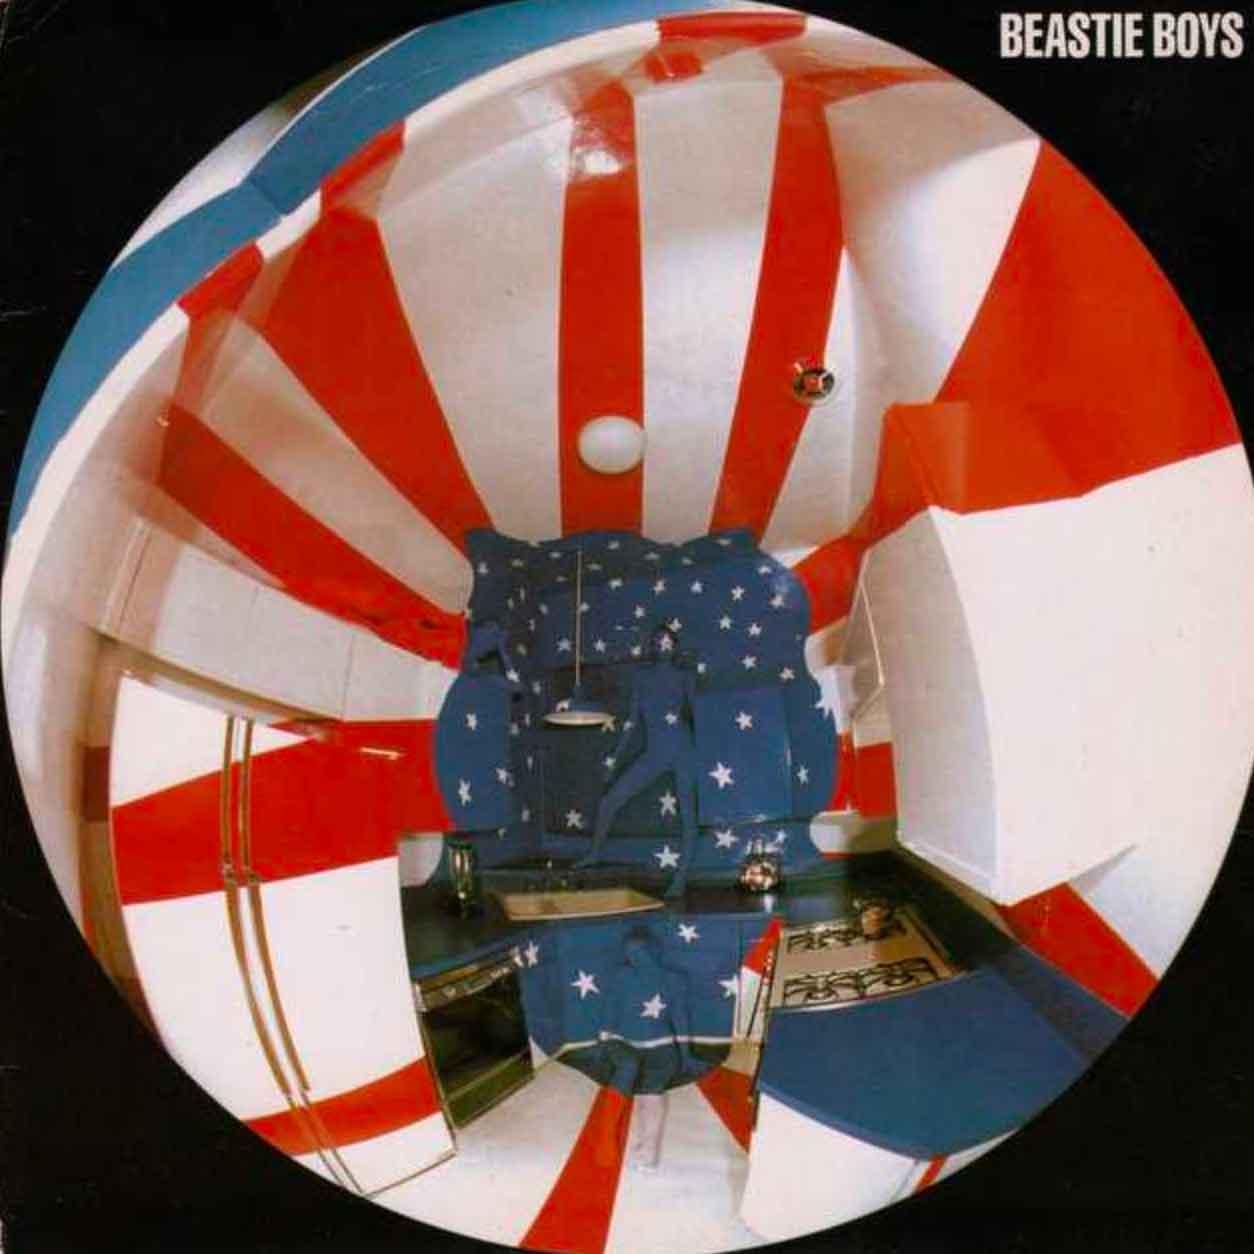 beastie-boys---heyladiesUS7A